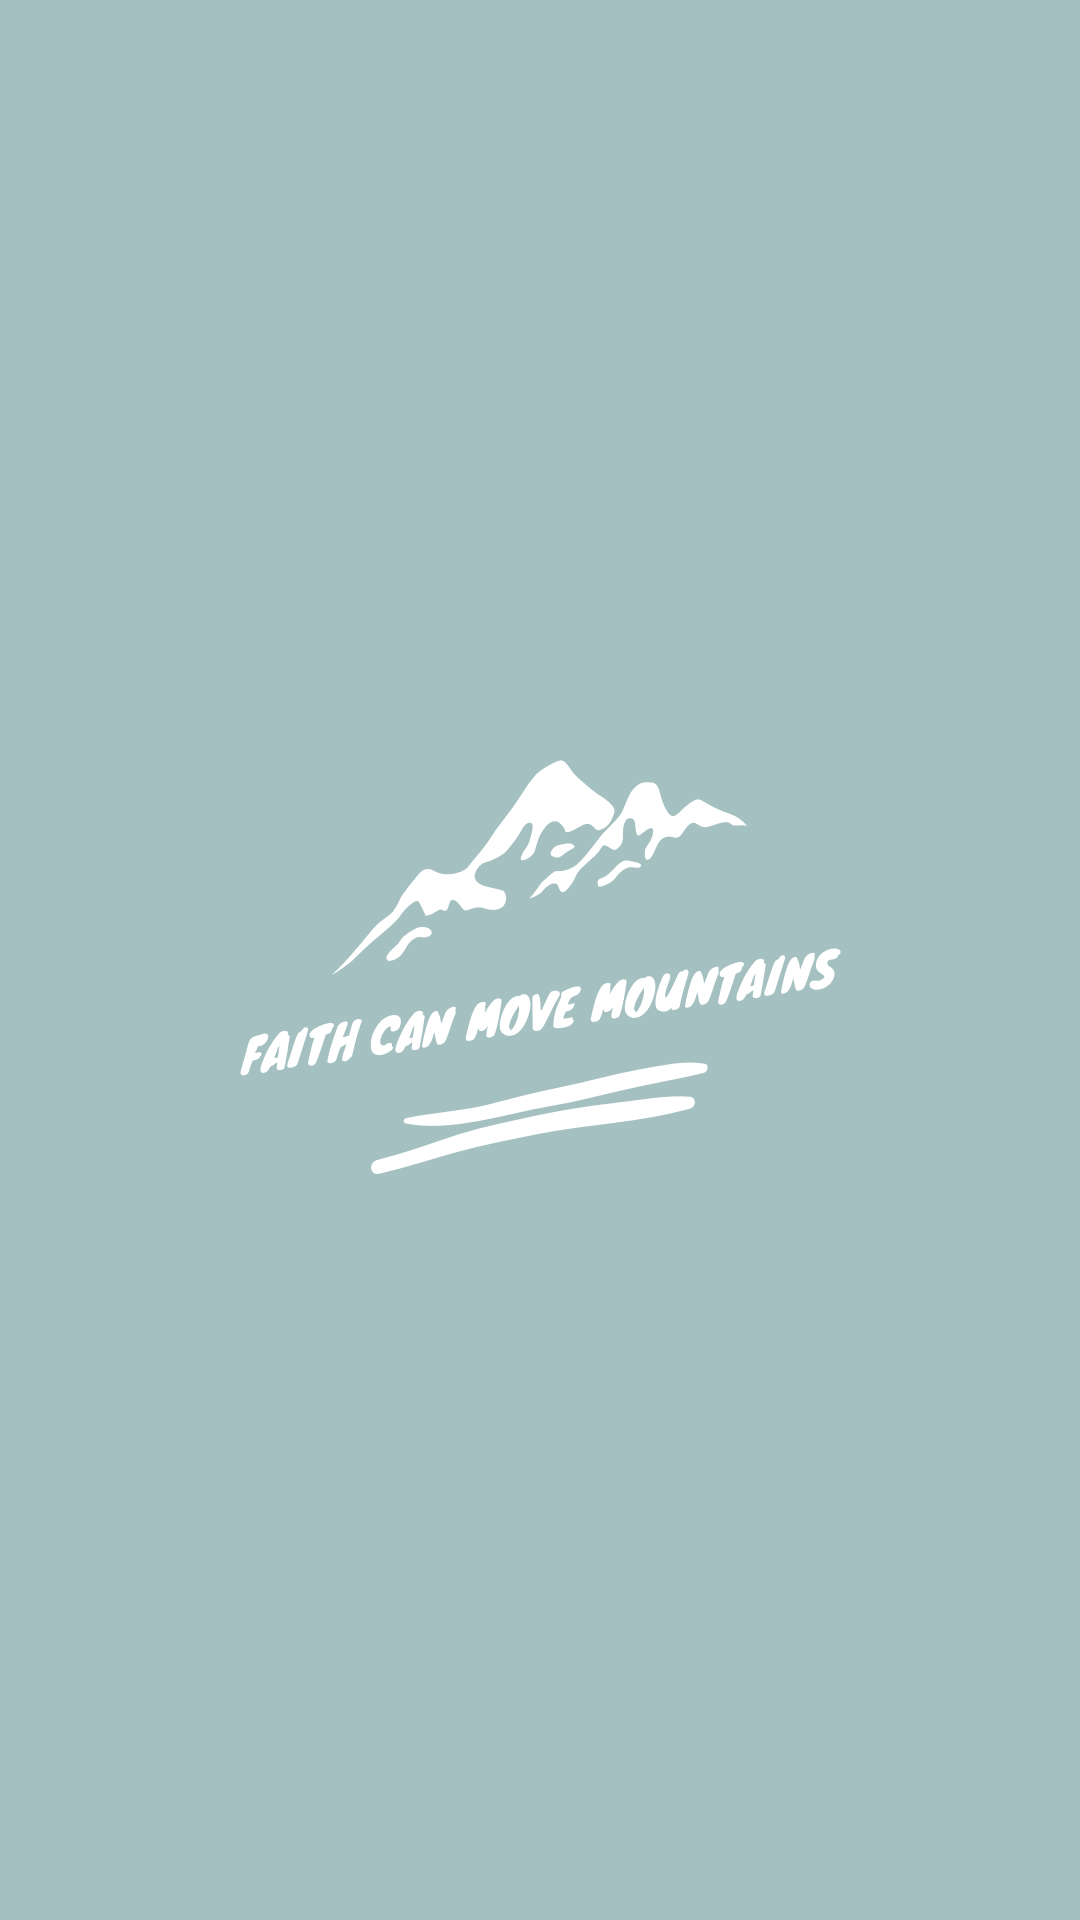 Faith Can Move Mountains Christian Quotes Inspirational Christian Quotes Wallpaper Christian Quotes